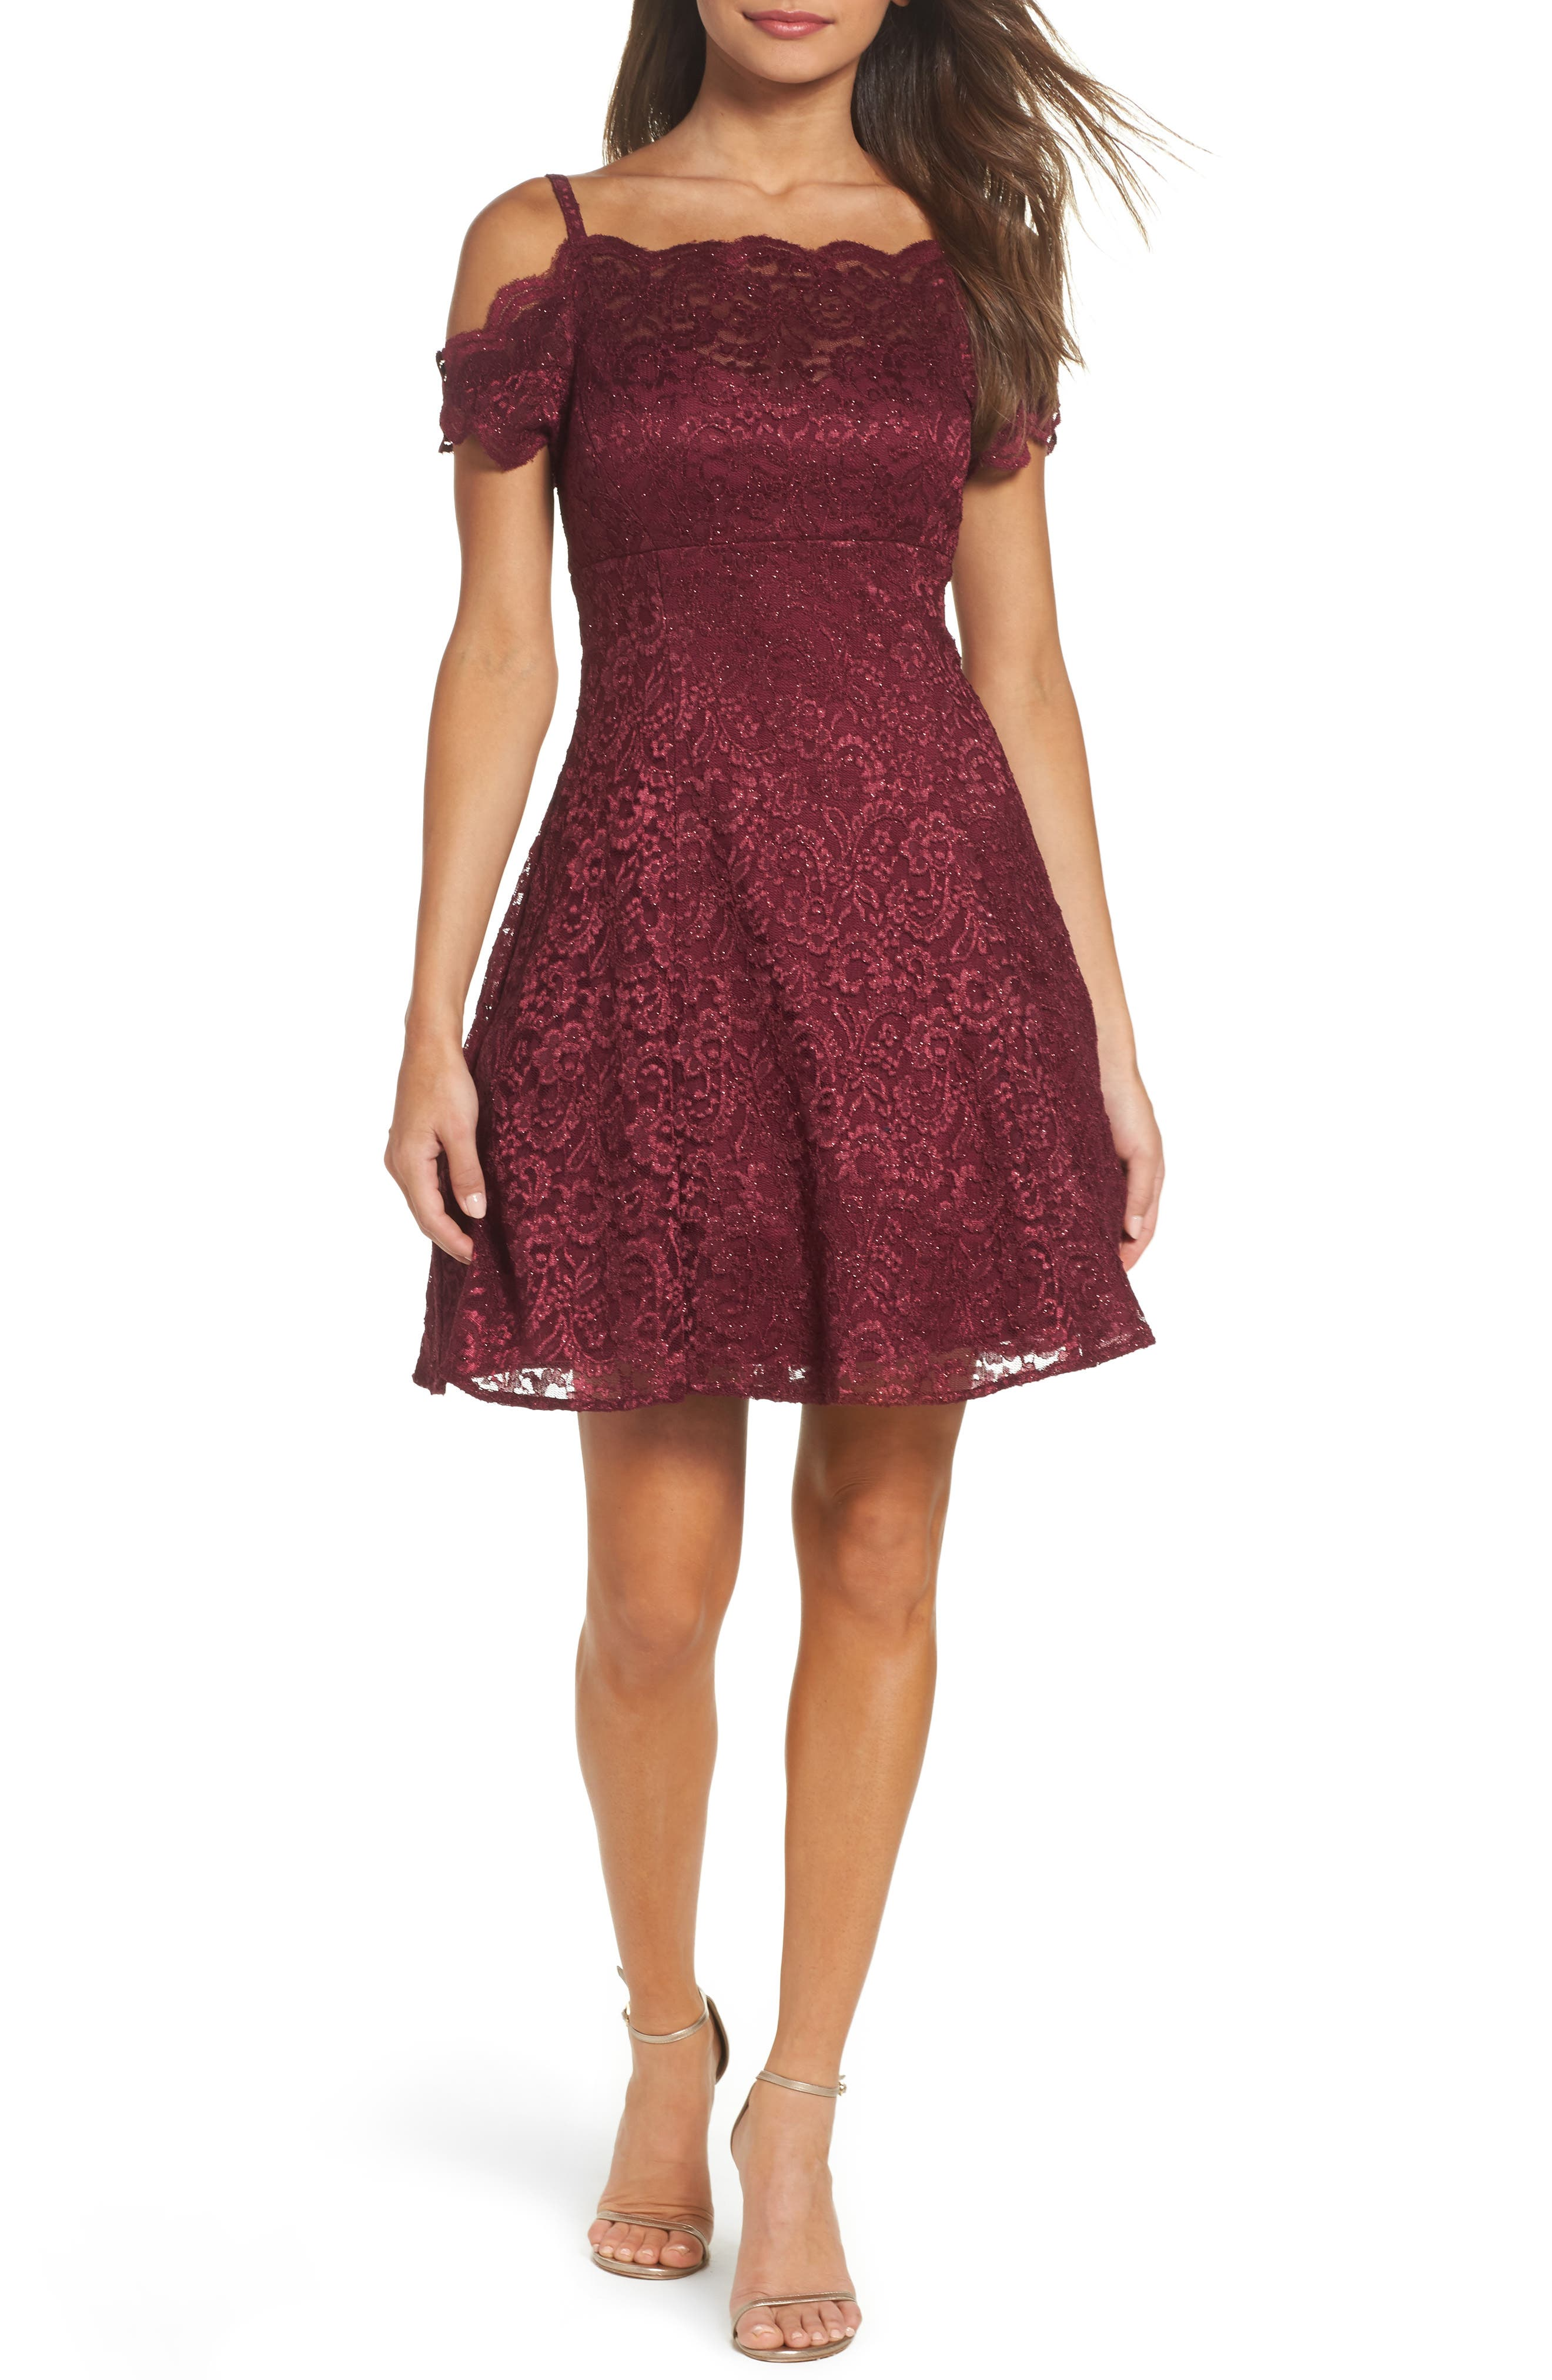 Size 0 Dresses for Juniors